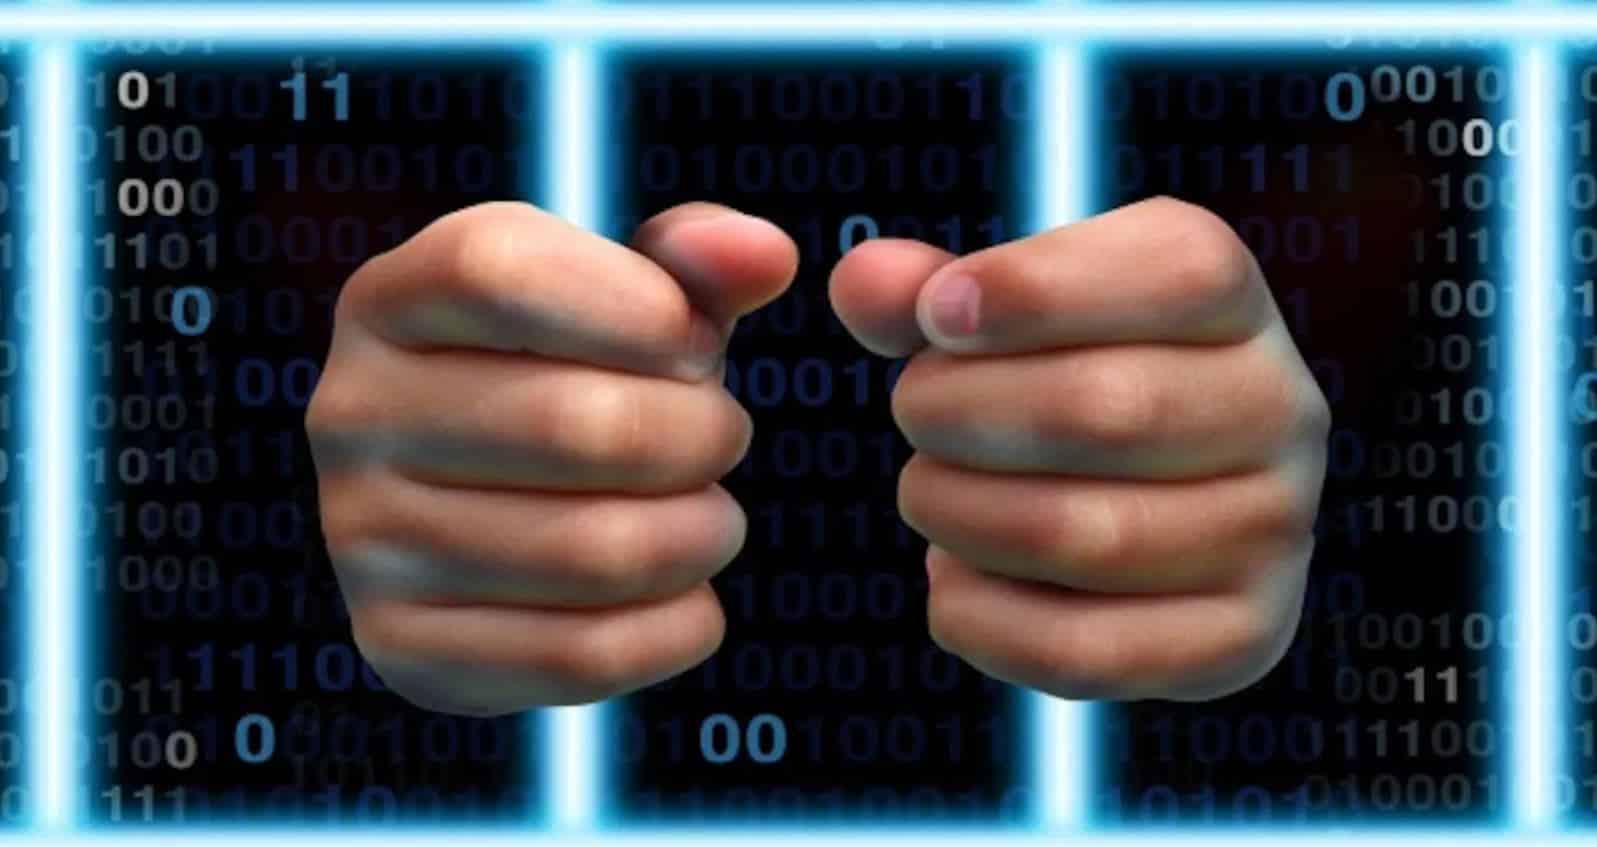 James Corbett Interview – COVID-19 Censorship, Technocracy & The Amazing Country Of Digital Gulag 1